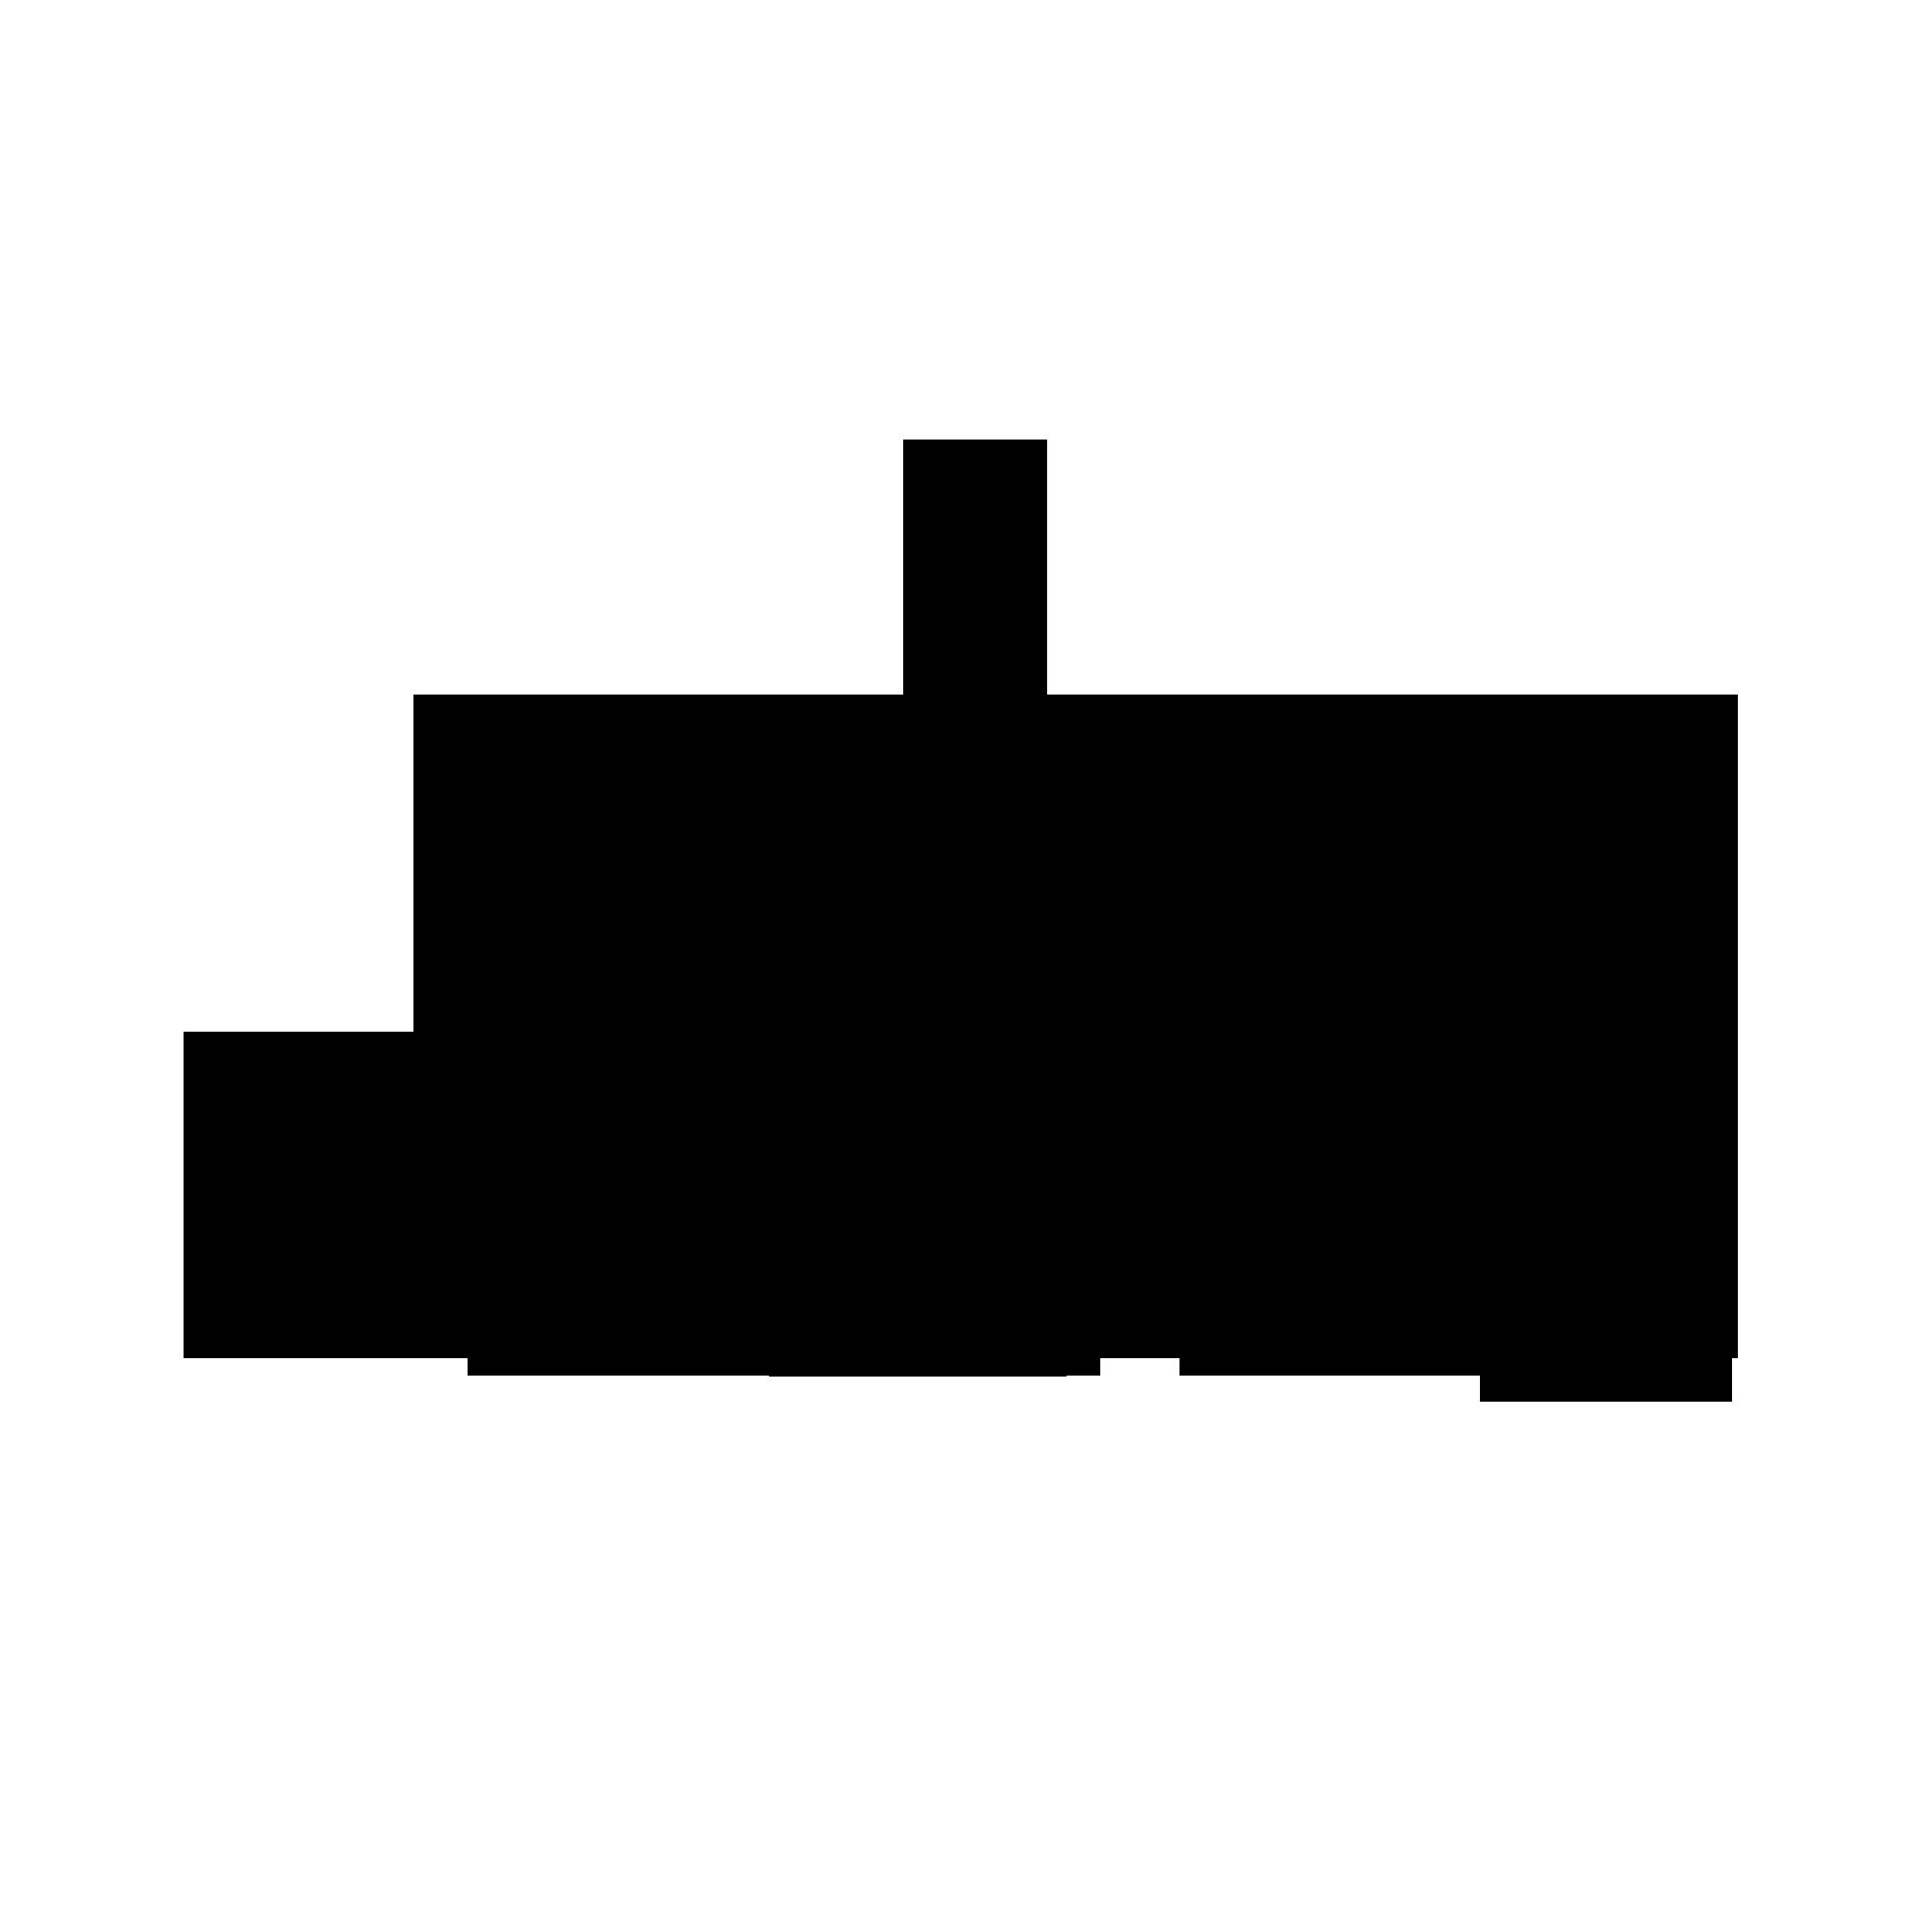 Arafat Sign In Tawasol Global Symbols